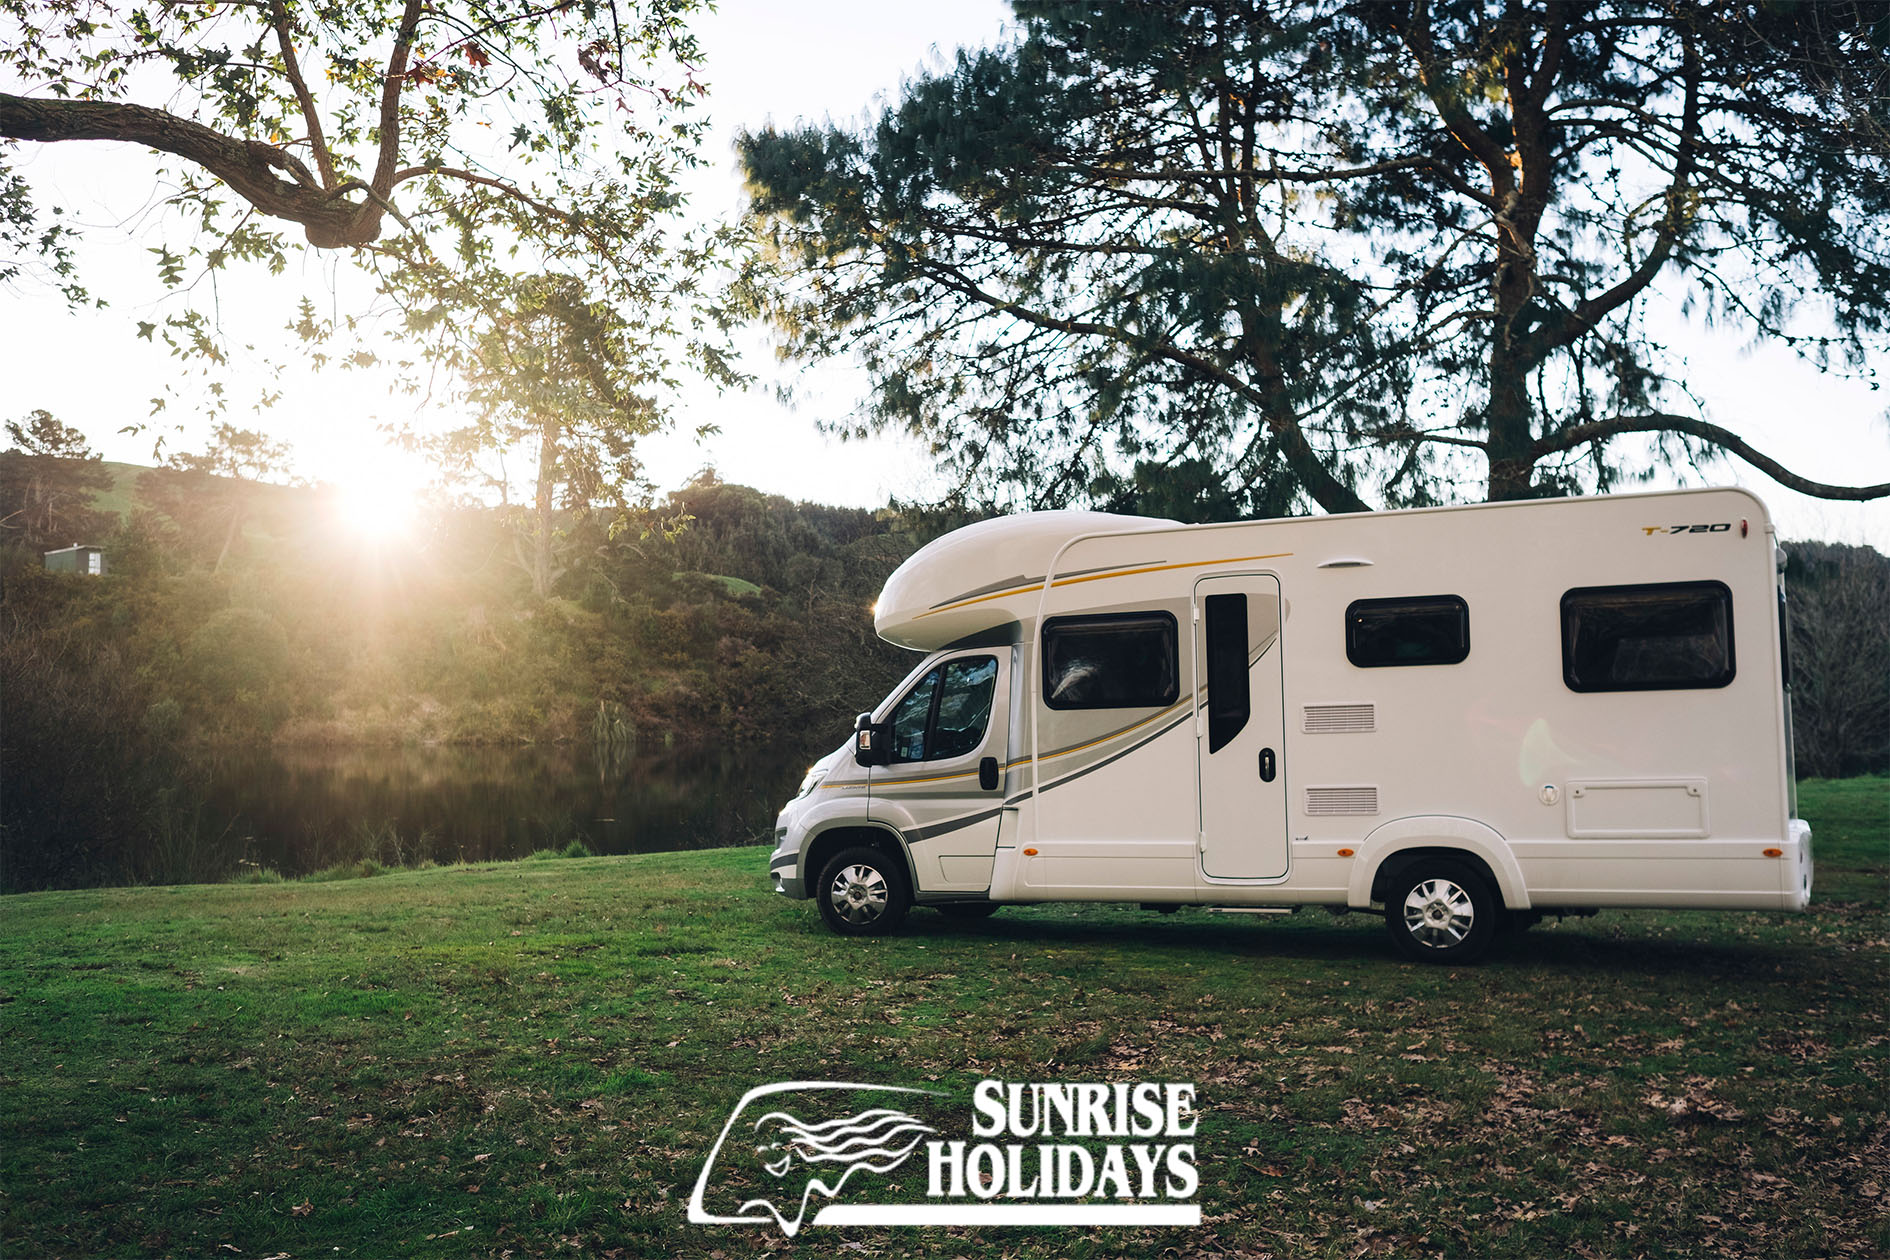 Sunrise Holidays Campervan Hire Auckland Region NZ